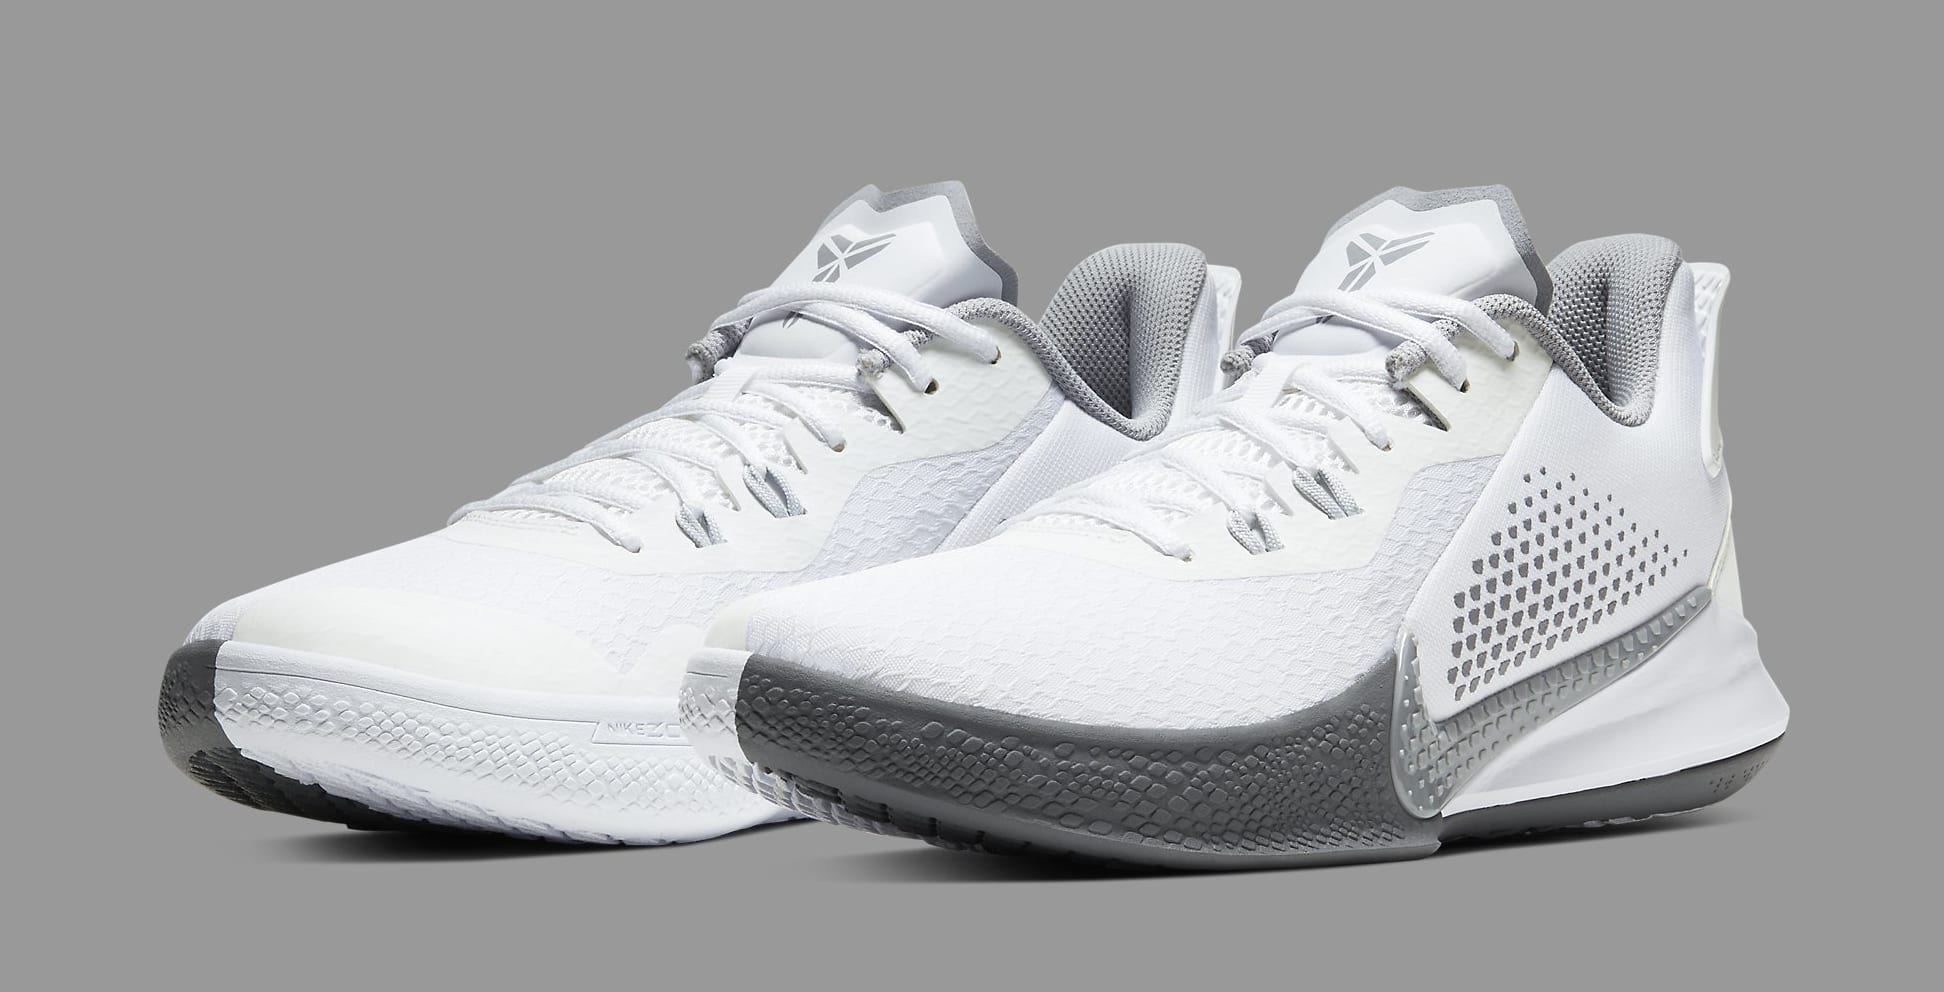 Nike Kobe Mamba Fury CK2087-100 Pair